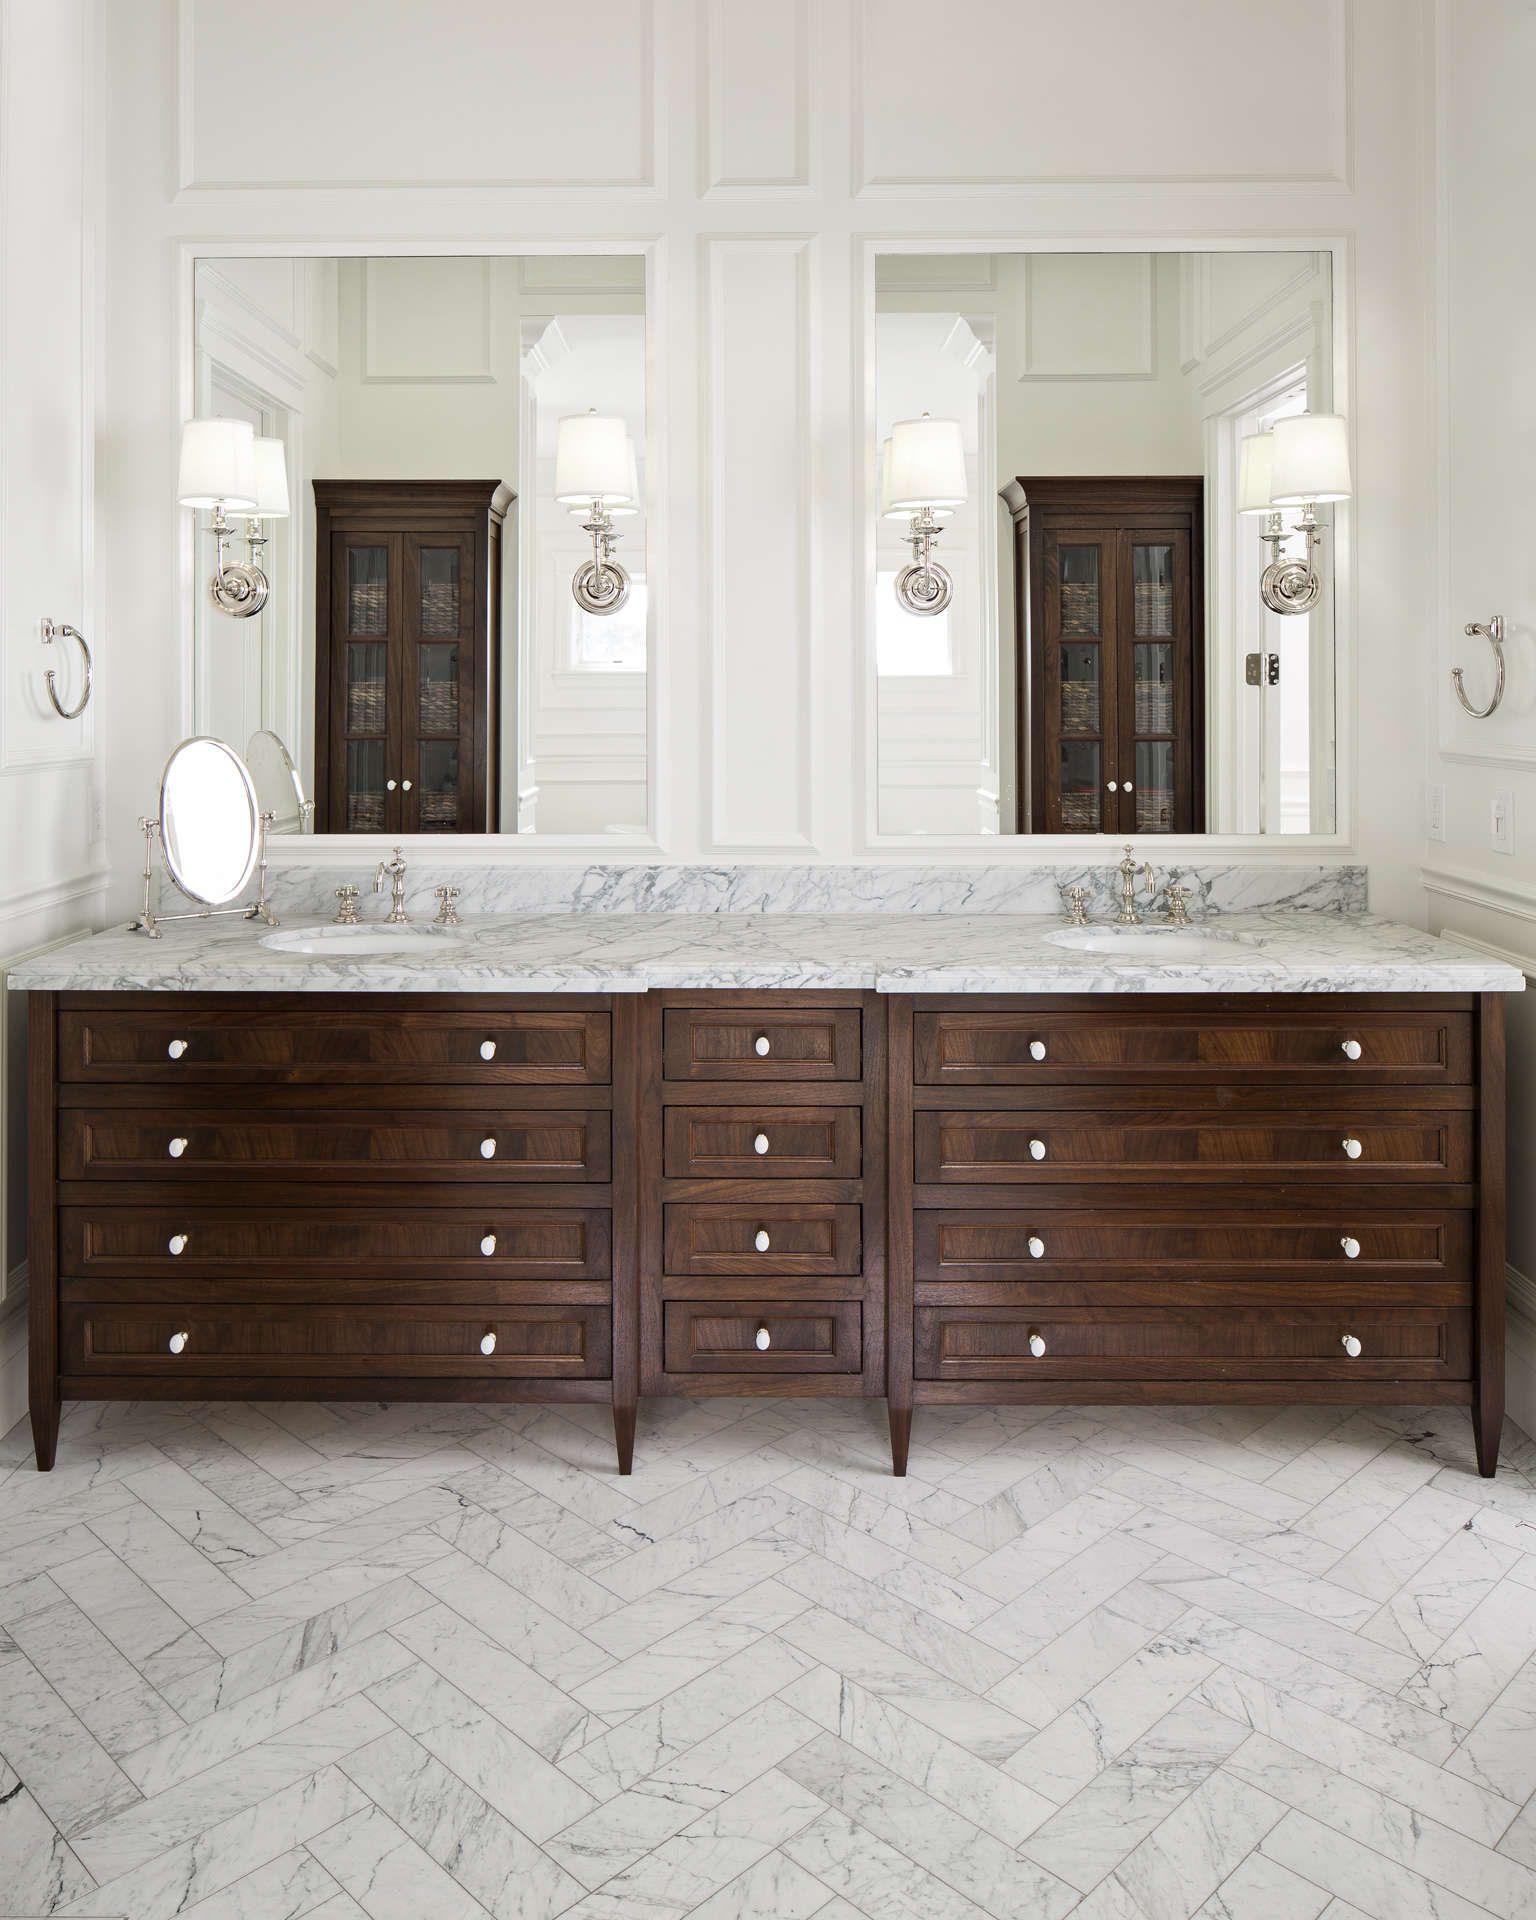 Classic Traditional Design Details To Inspire Dark Wood Bathroom Traditional Bathroom Herringbone Tile Floors [ 1920 x 1536 Pixel ]